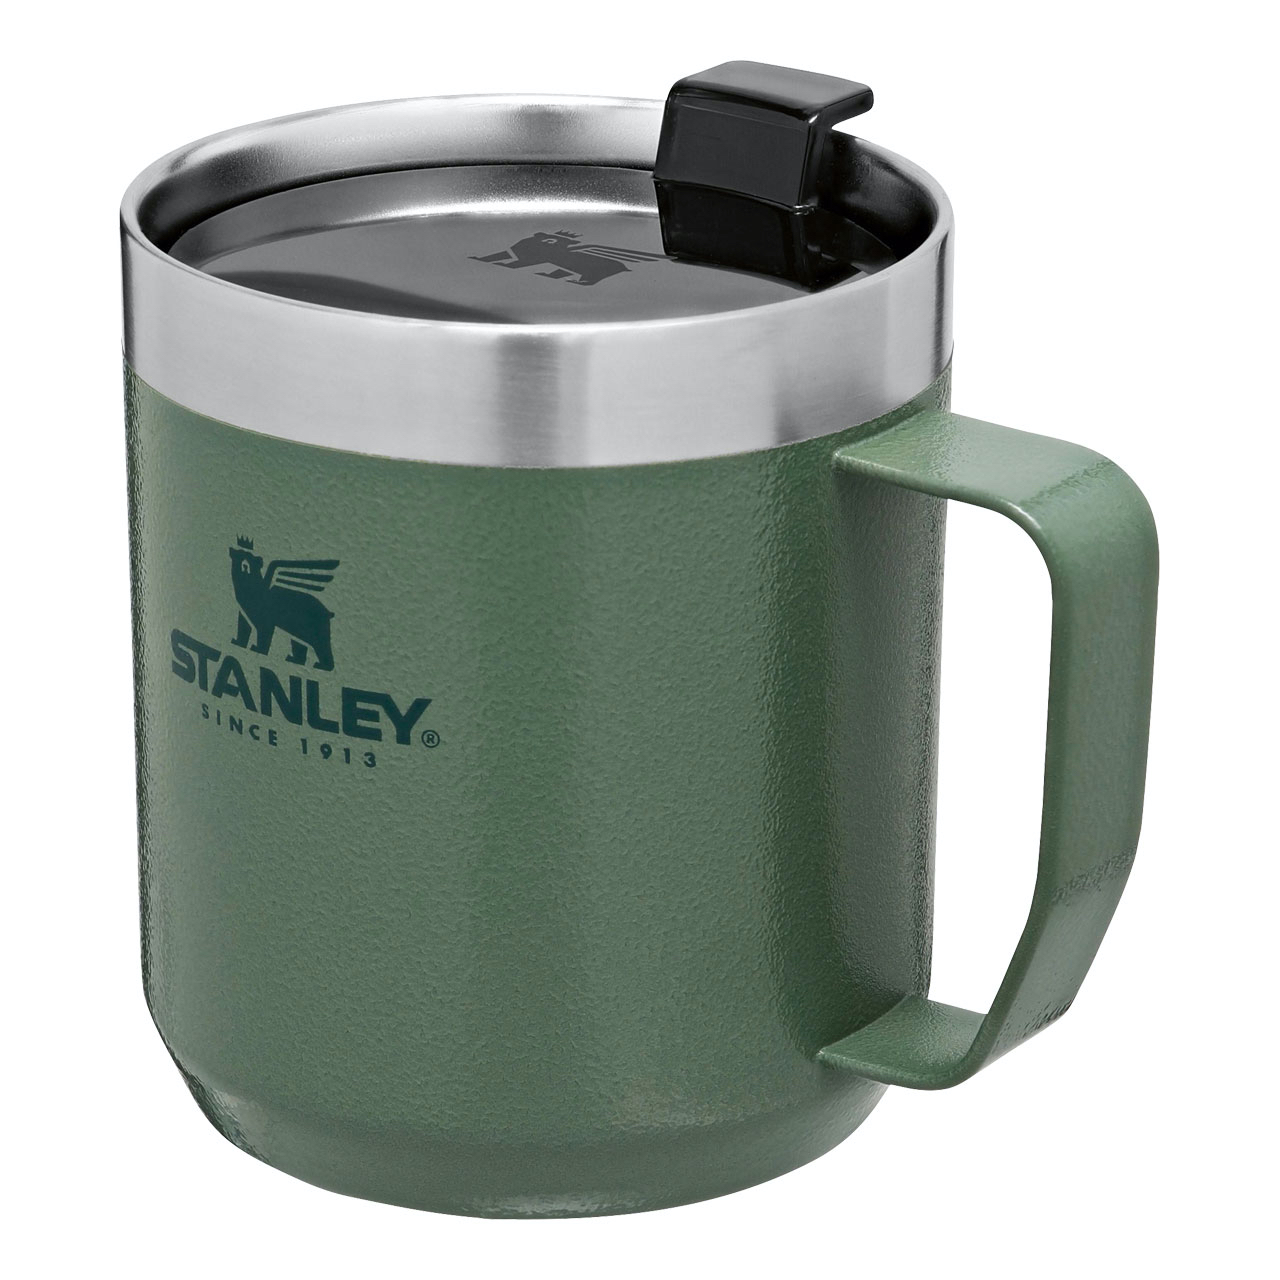 Classic Legendary Camp Mug 354 ml - Hammertone Green